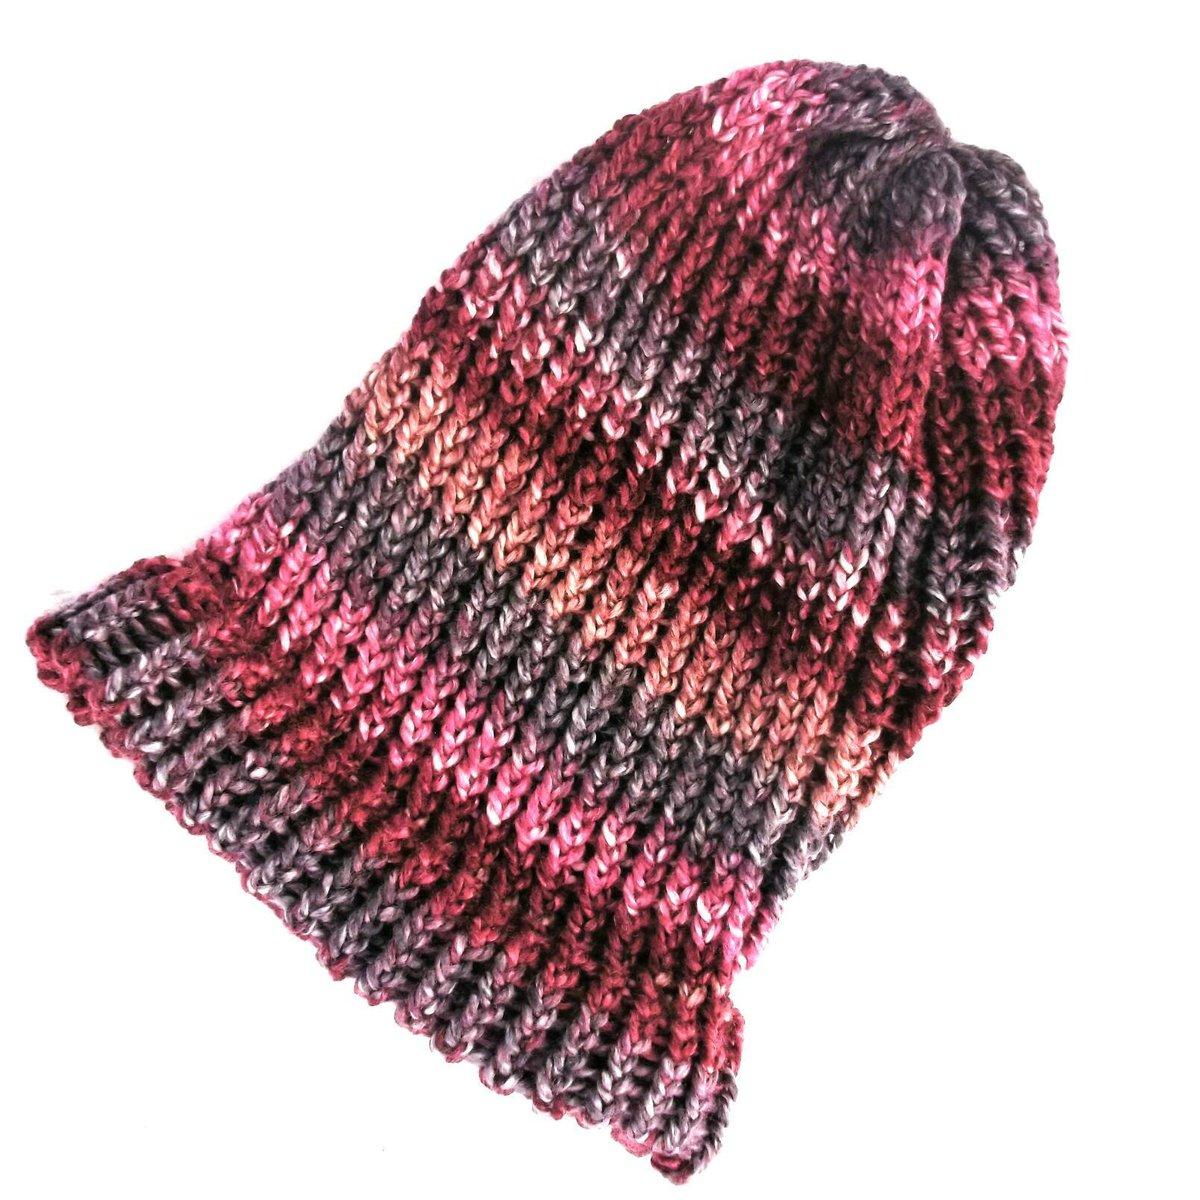 4a77efd2 ... wool hat, loose knit slouch hat, pink dreadlock tam, winter beanie hat,  vegan clothing, 90s grunge https://etsy.me/2pB0Bvn #Knittedhats  #Handmadehour ...